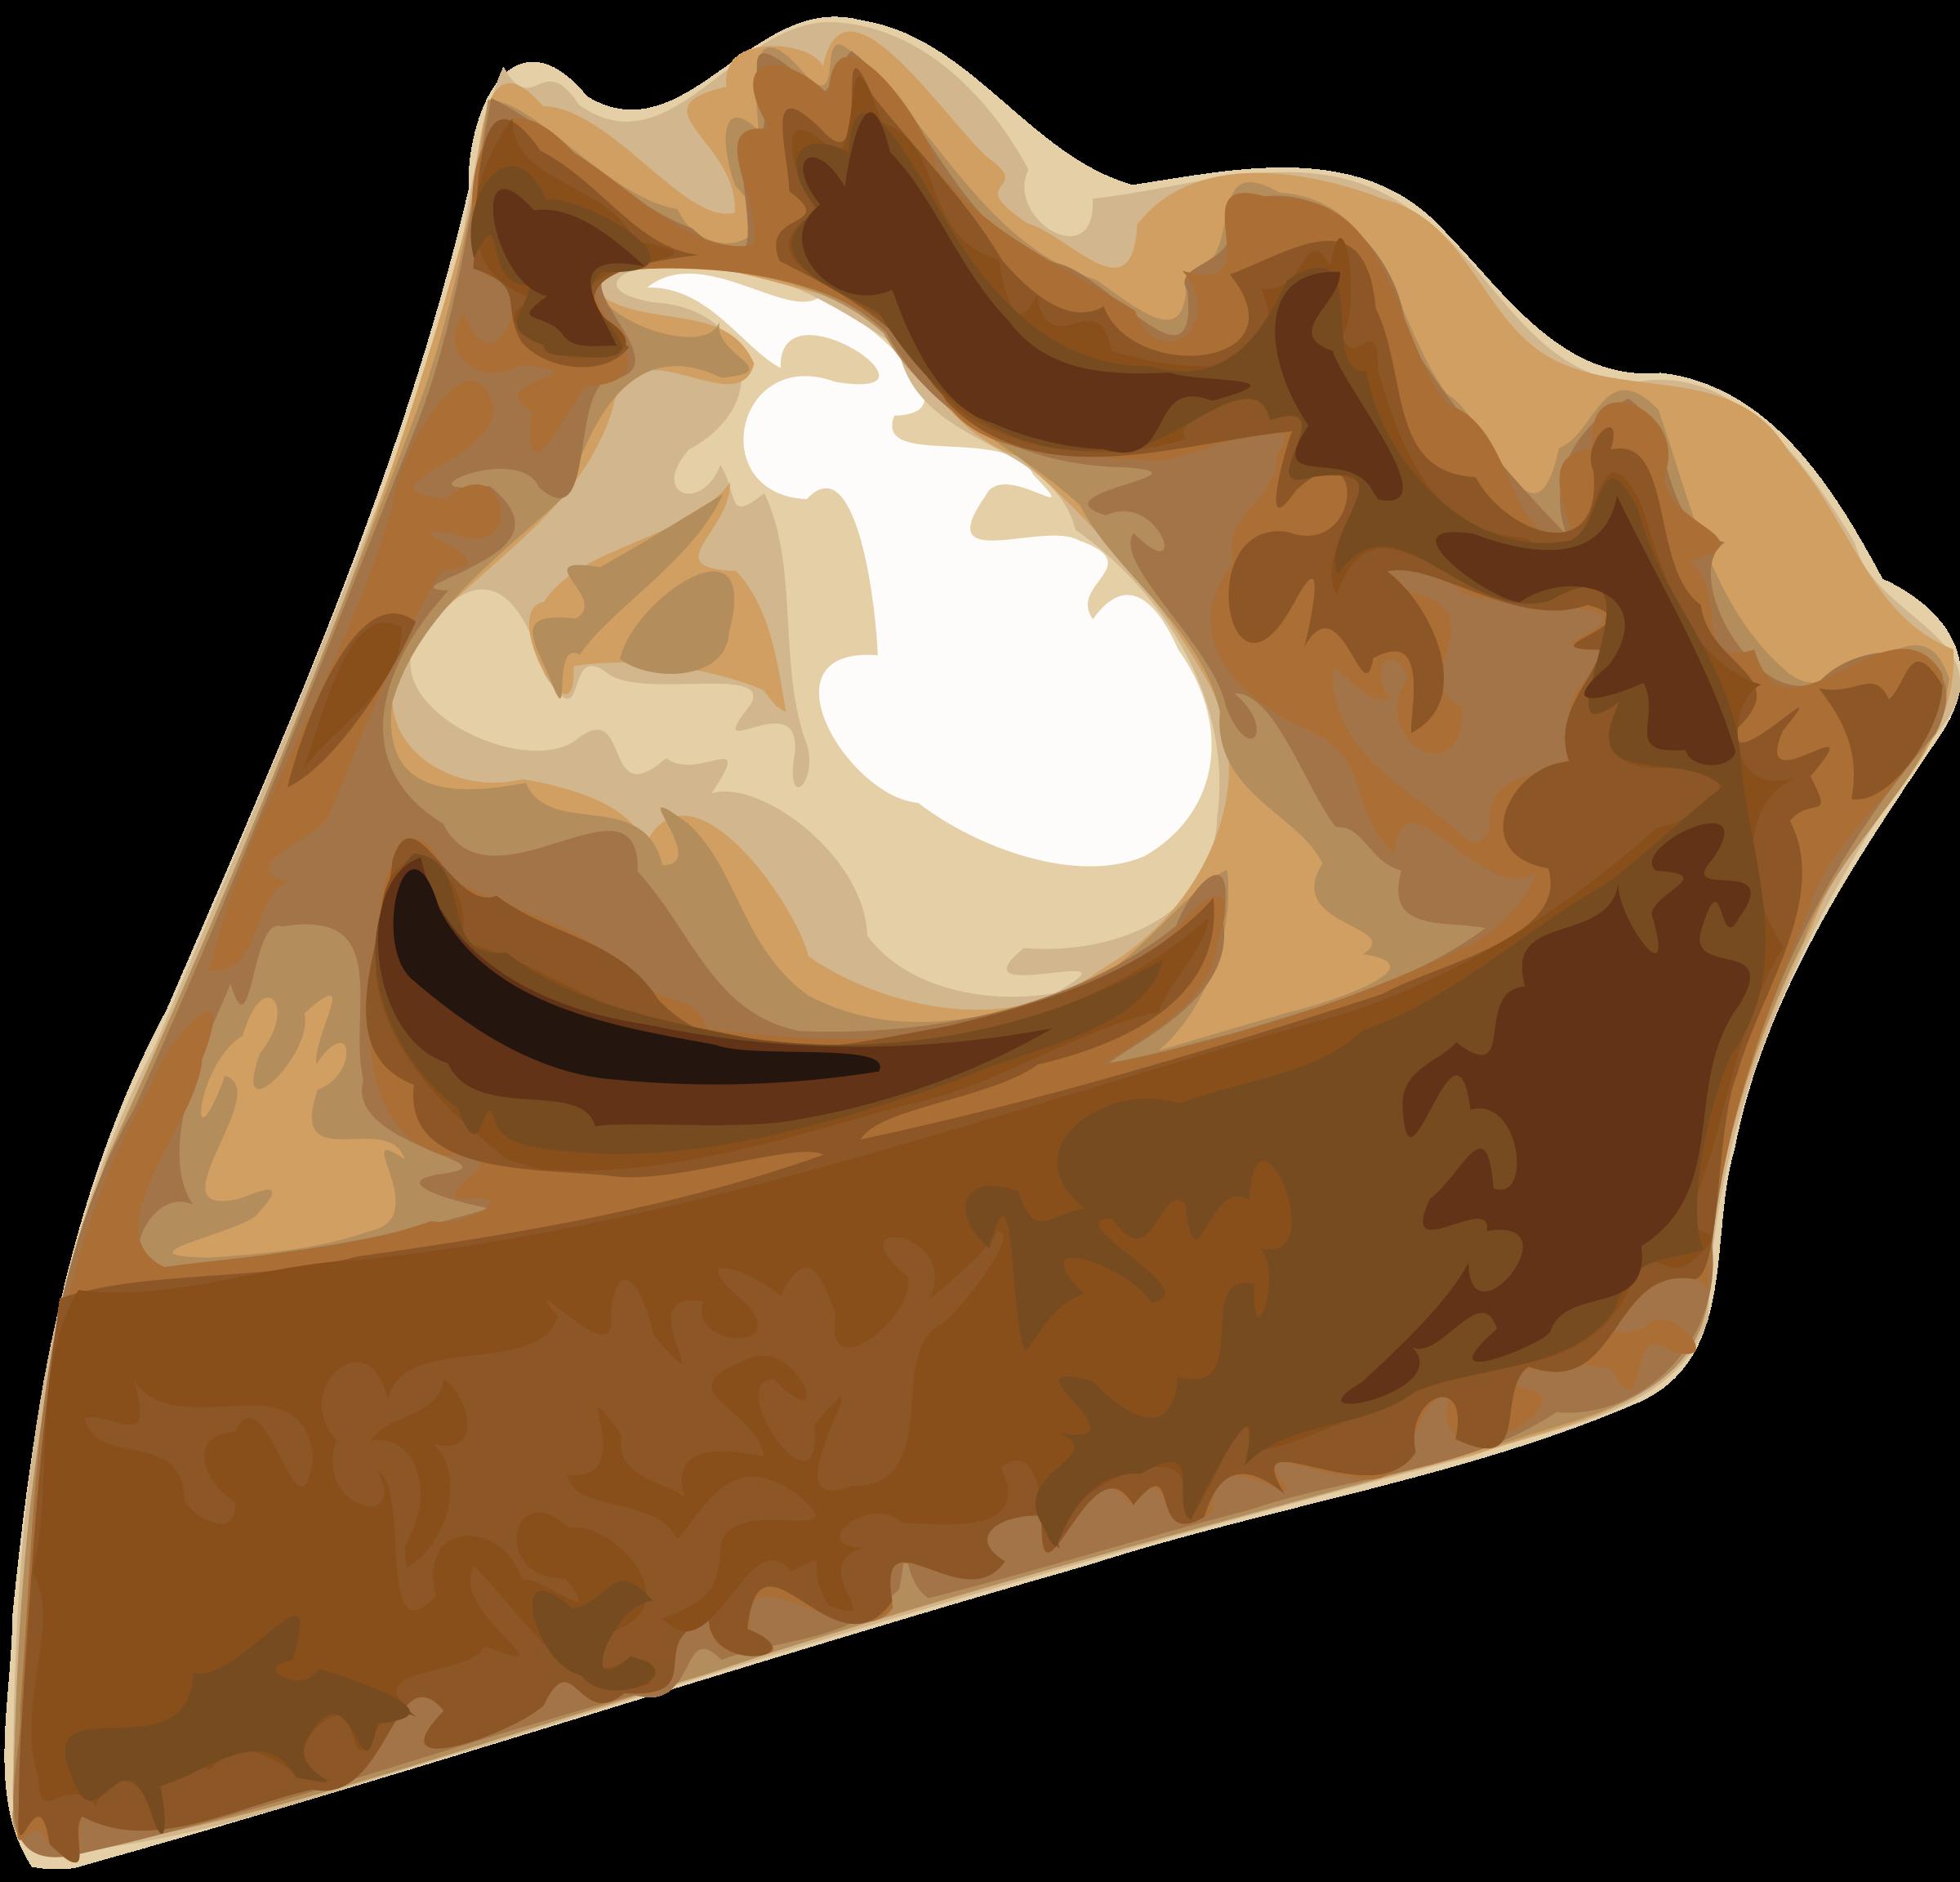 Slice big image png. Pie clipart pumpkin pie